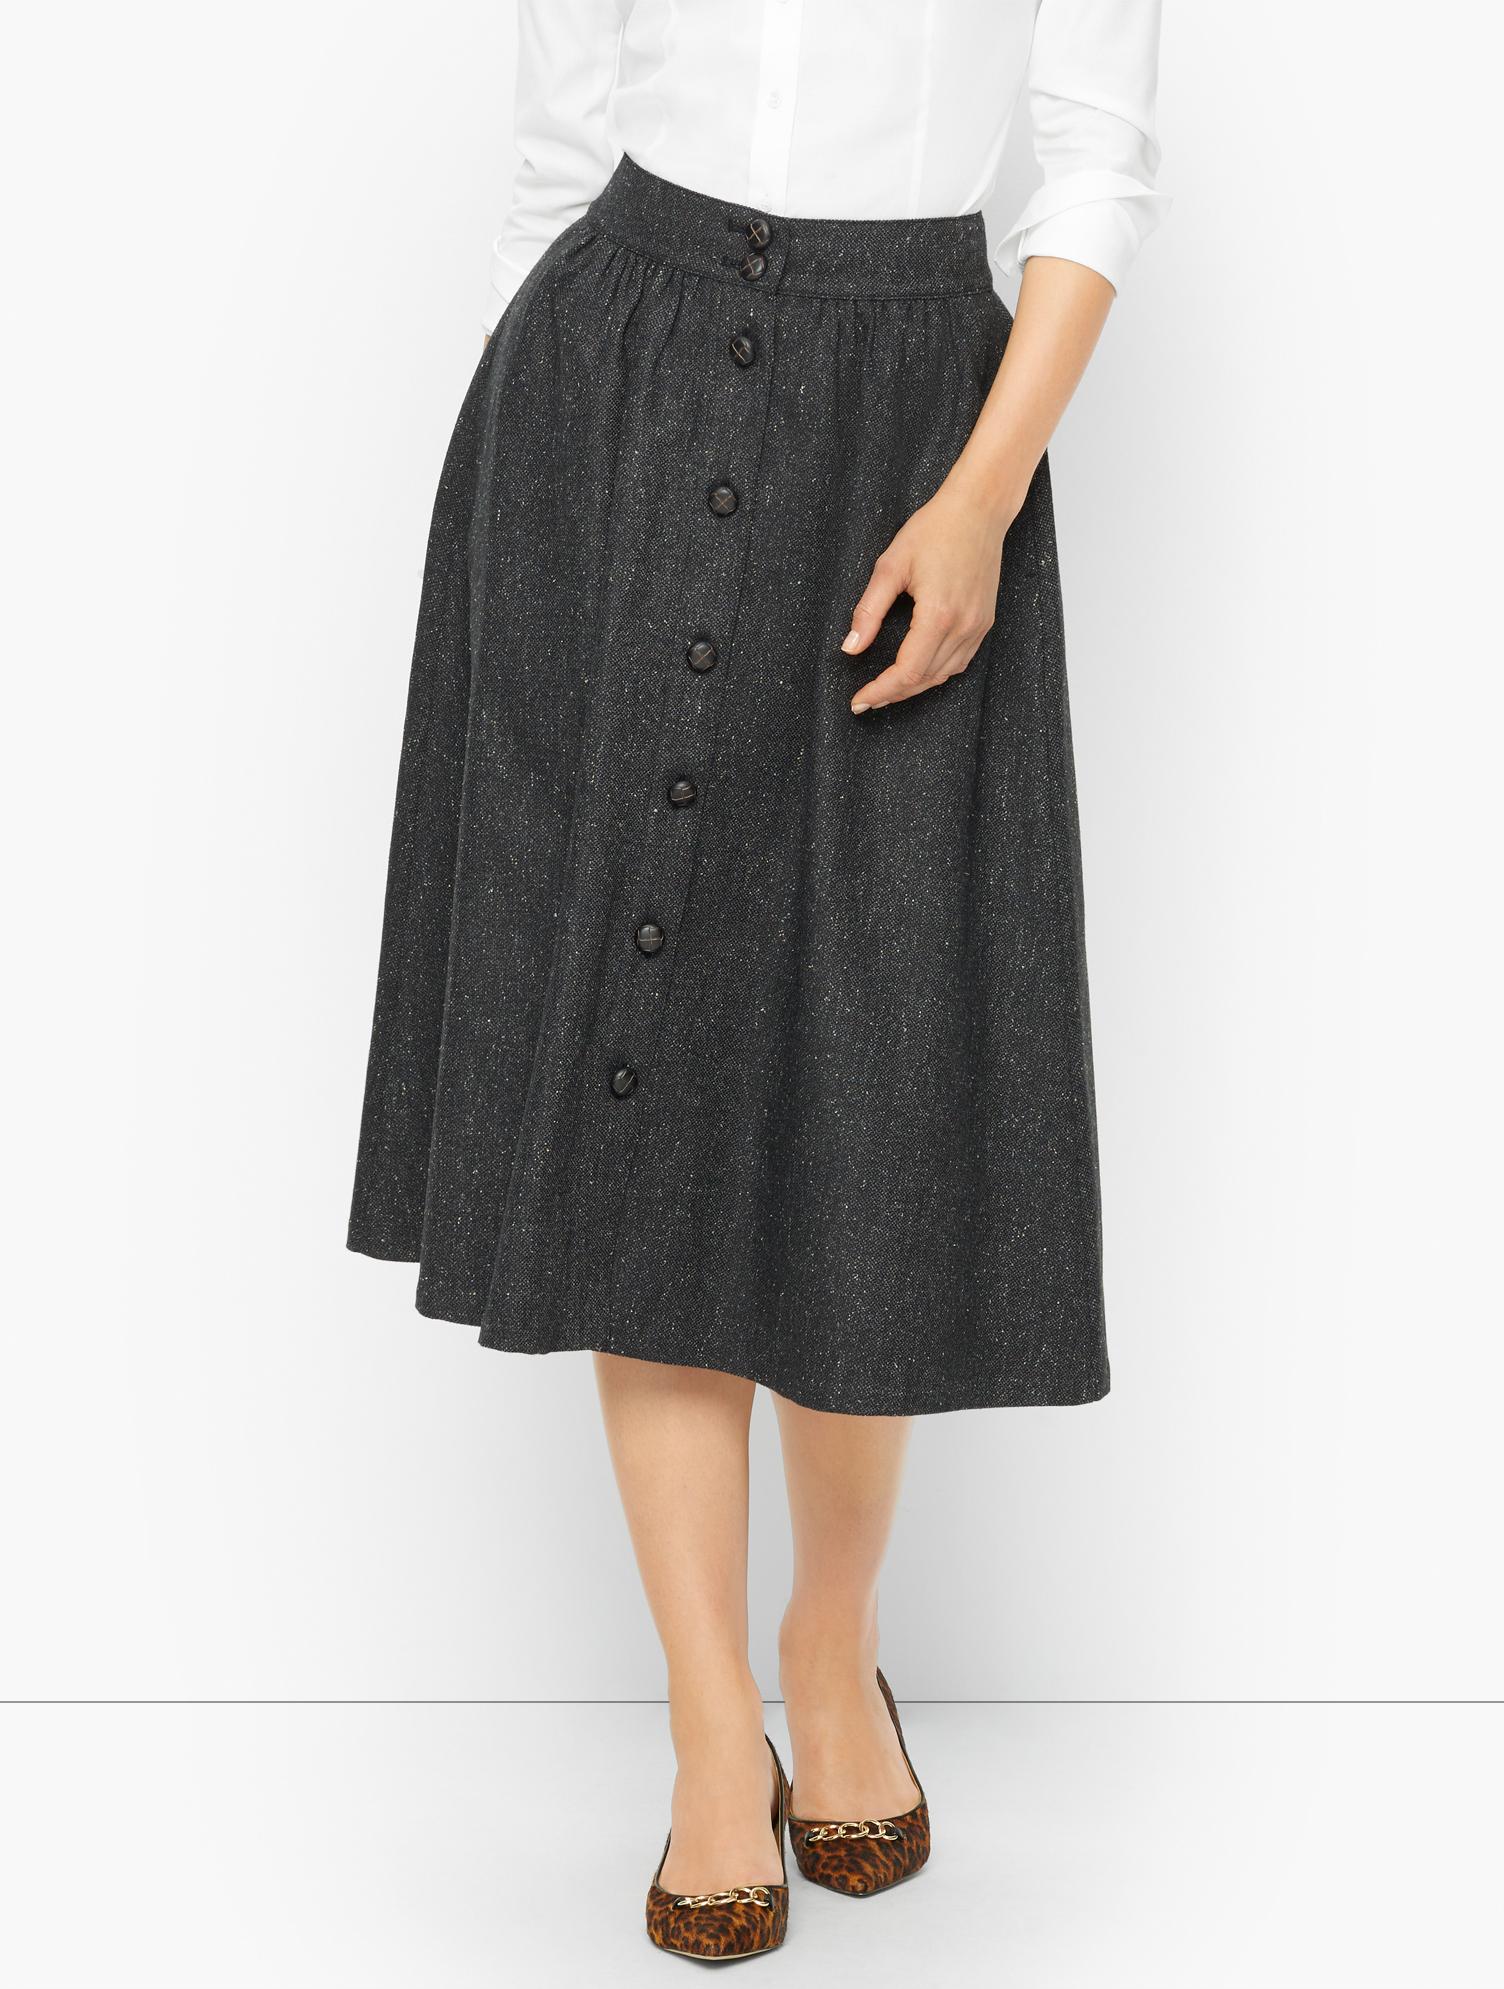 1940s Teenage Fashion: Girls Petite - Donegal Button Front Midi Skirt - Black - 16 Talbots $119.00 AT vintagedancer.com